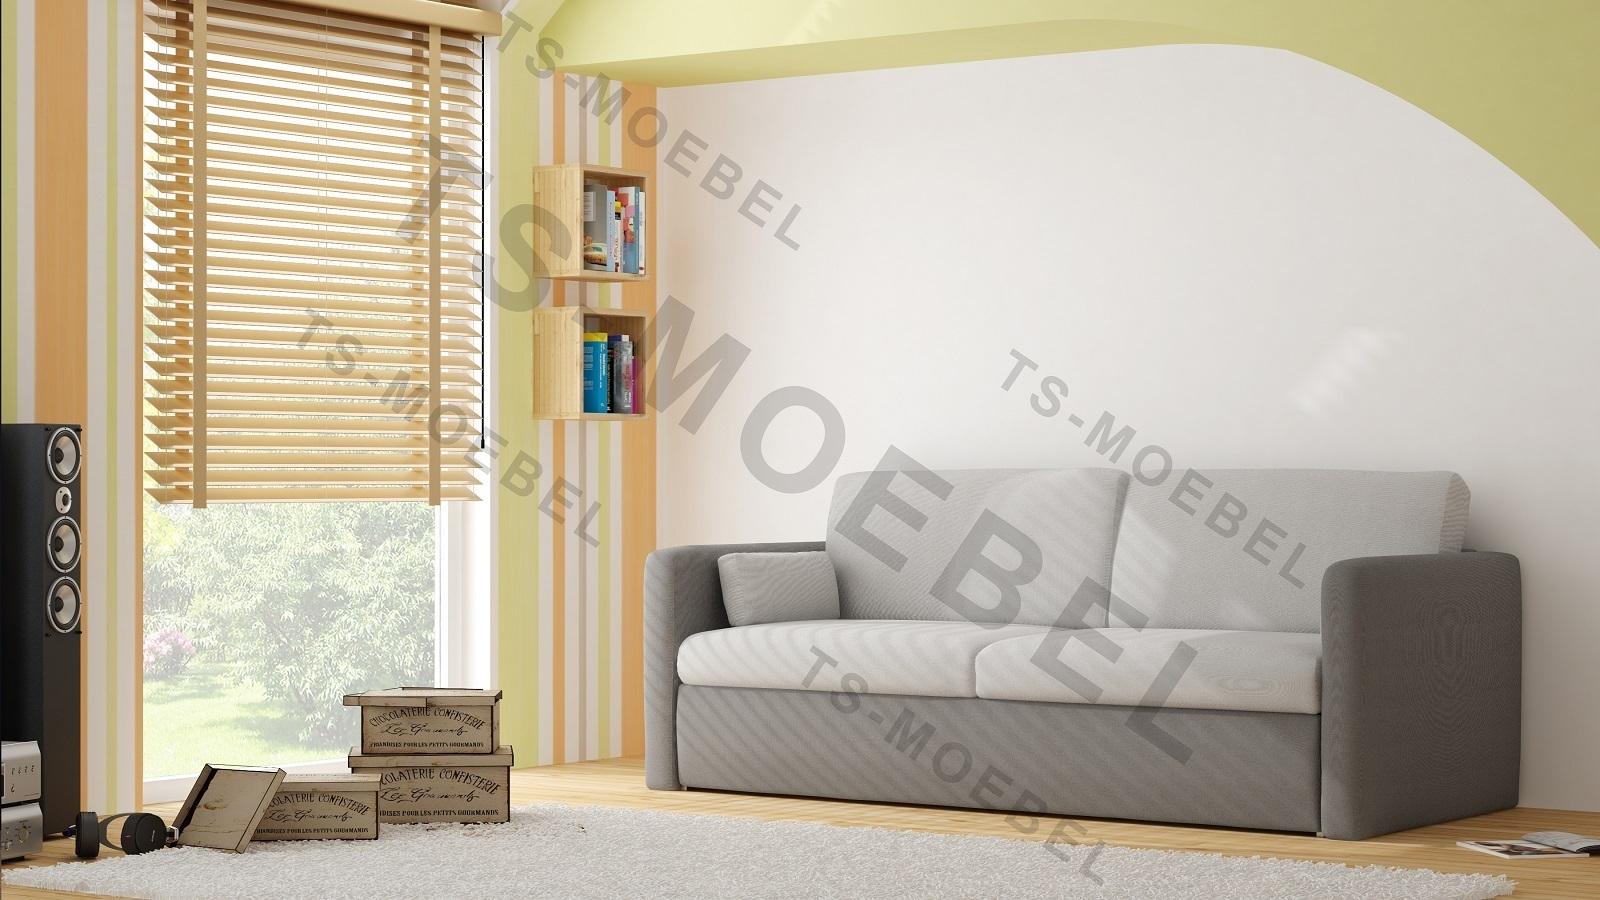 Etagenbett Sofa Duo : Ts möbel wall bed duo sofa mit etagenbett inkl matratzen neu